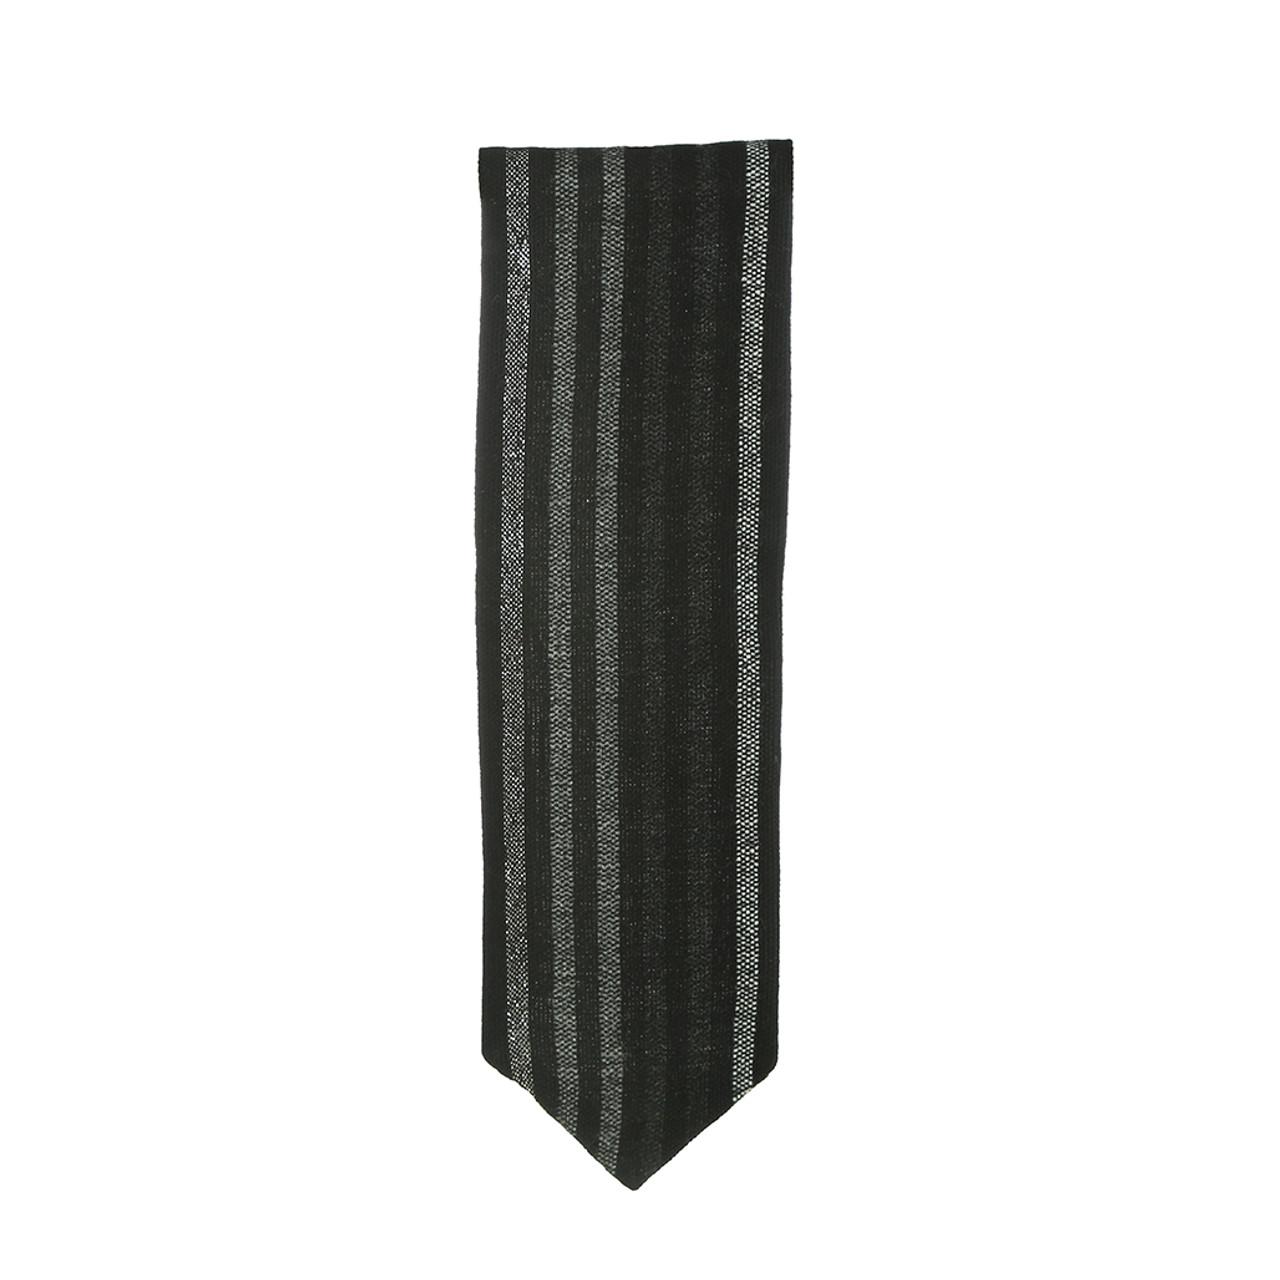 Handwoven Black, White & Gray Atara